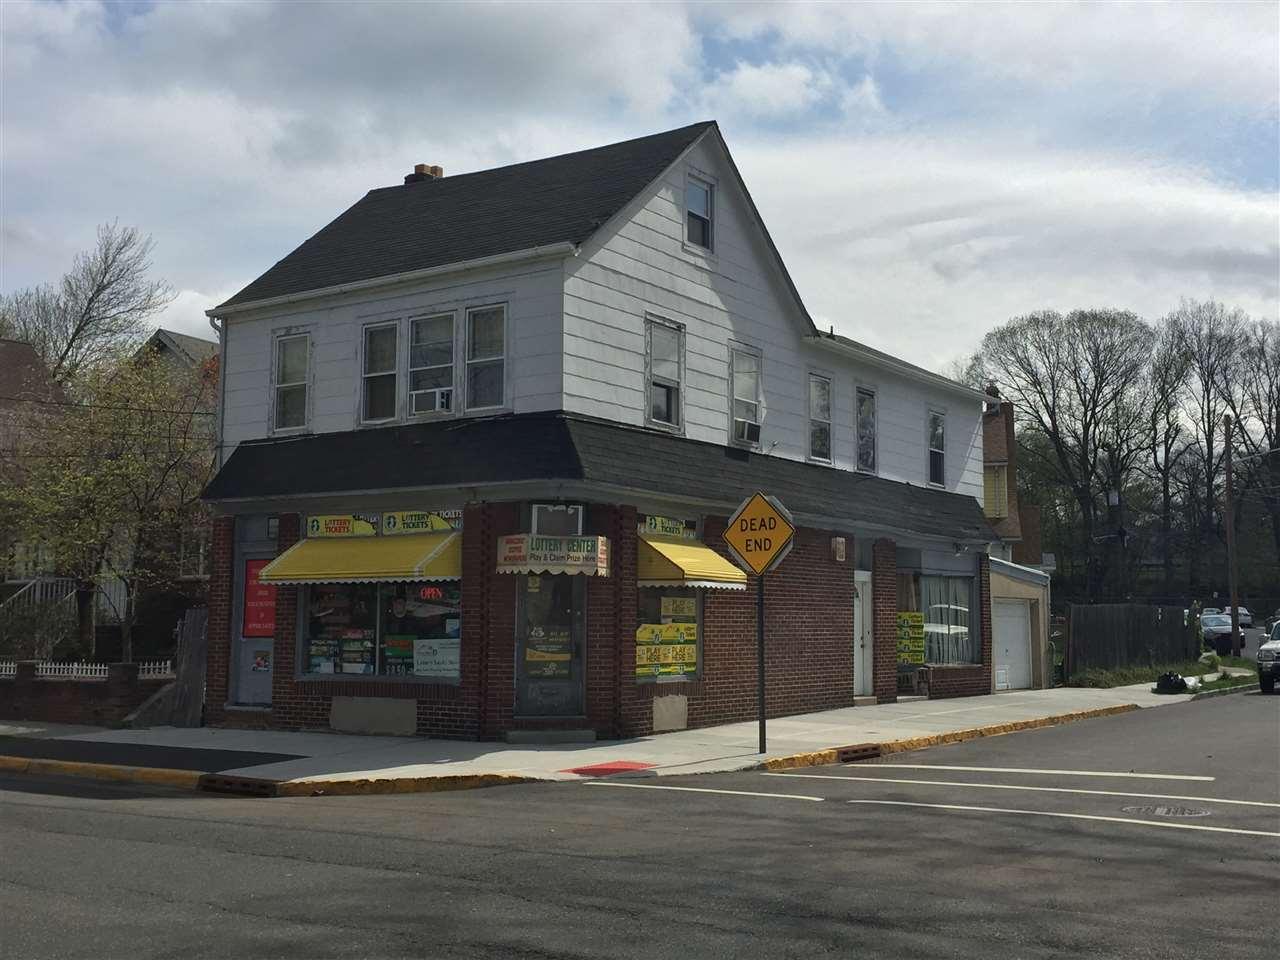 321 BROUGHTON AVE, Bloomfield, NJ 07003